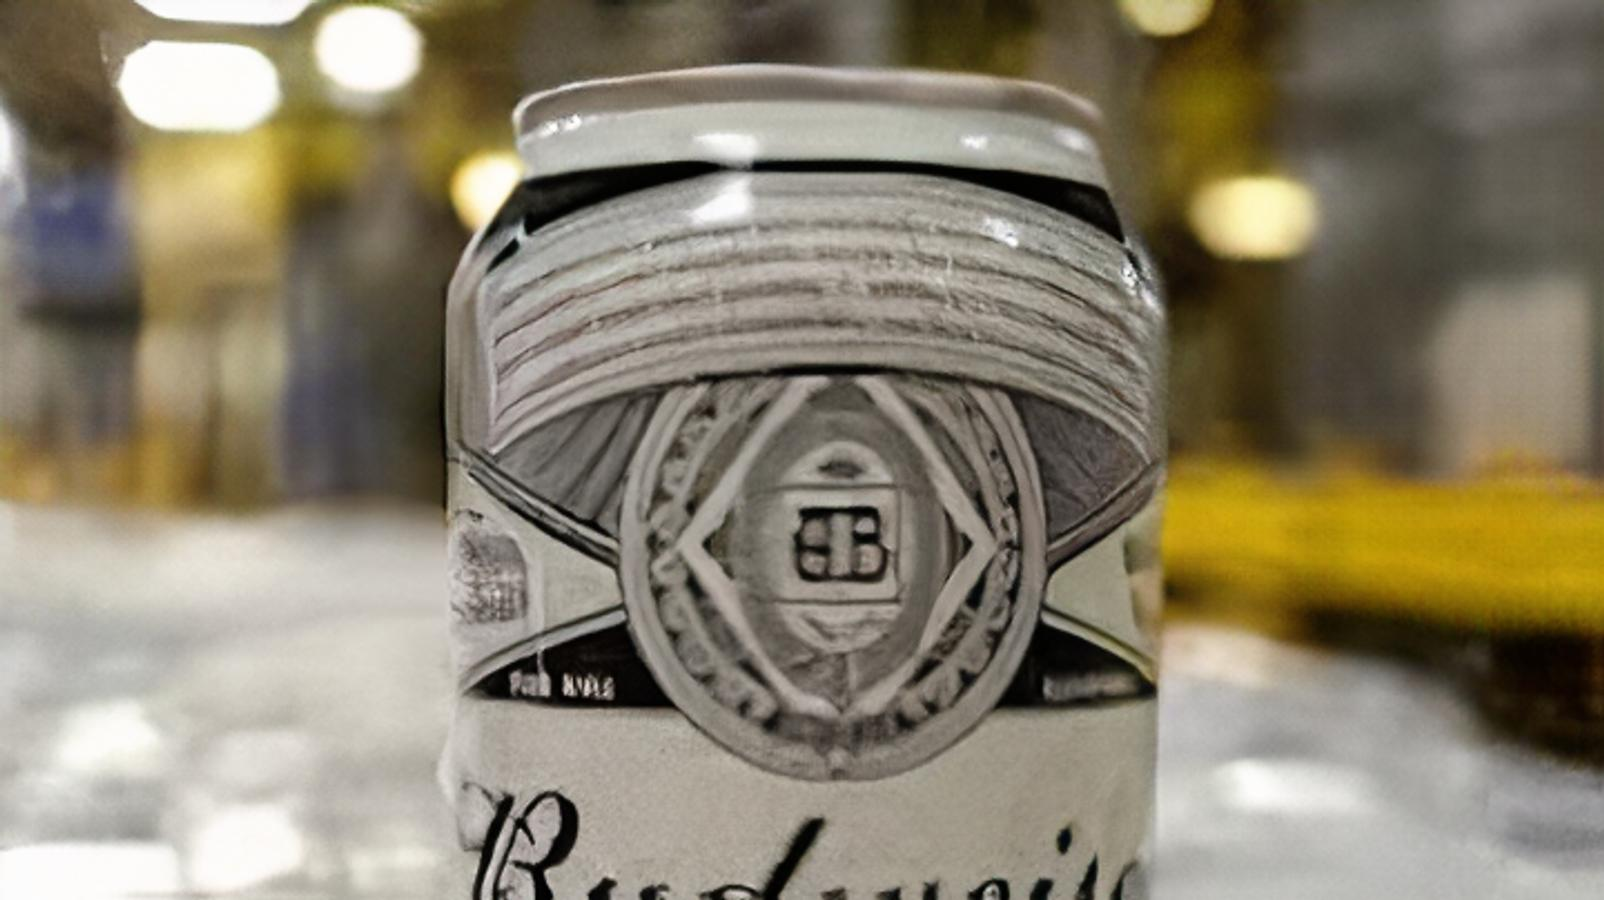 Budweiser Prohibition (Non-Alcoholic)